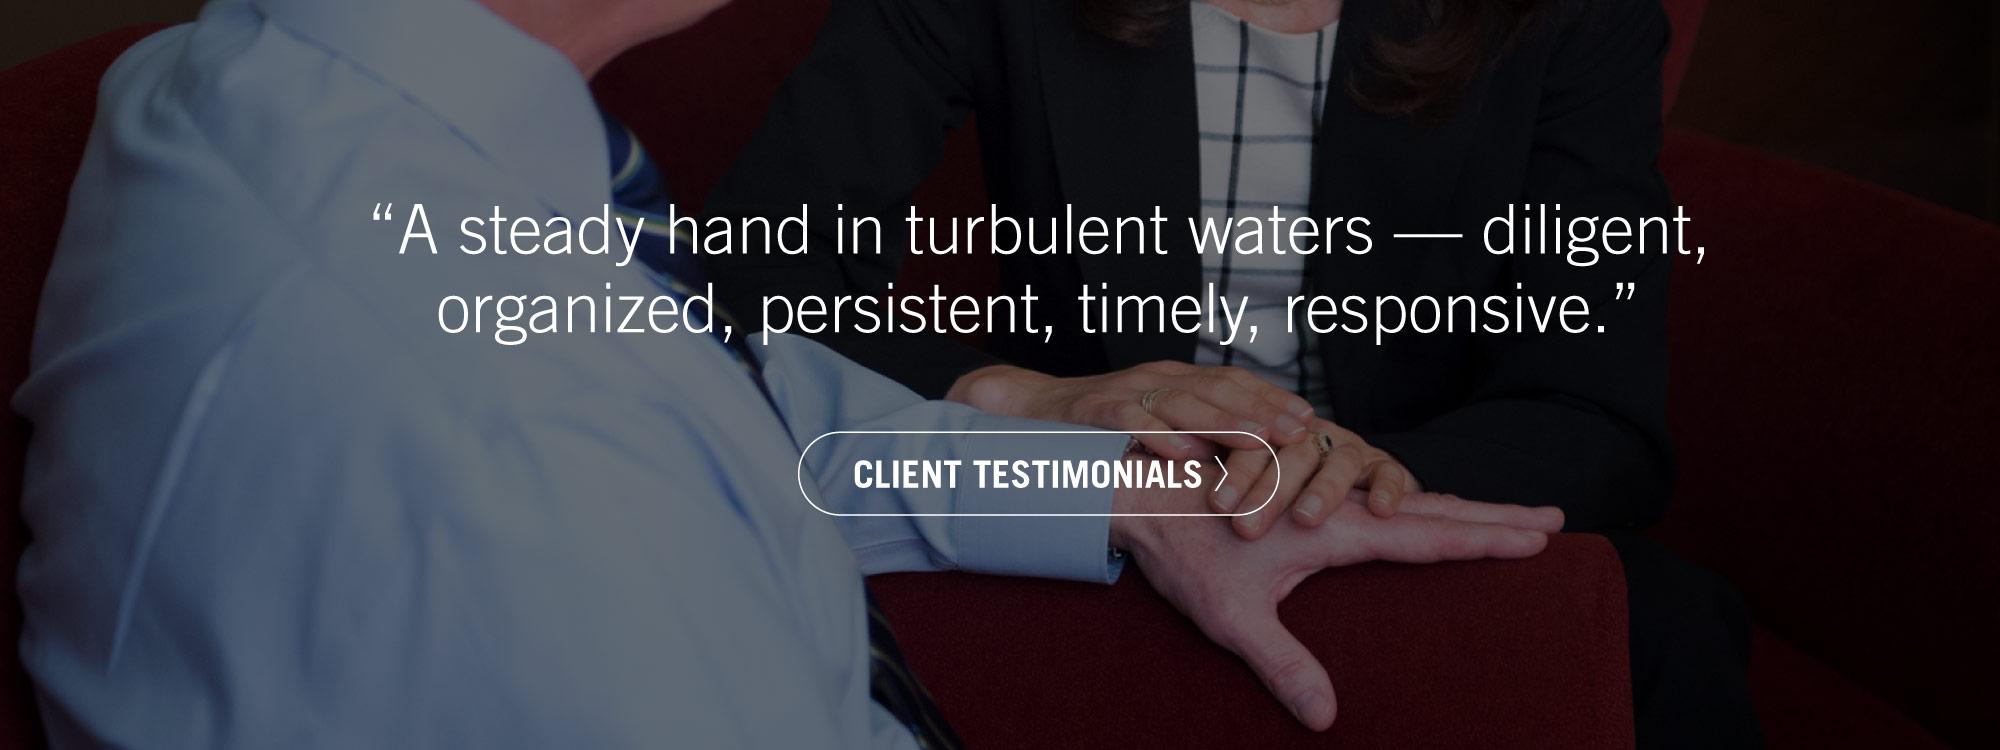 McManus & Associates - Client Testimonials